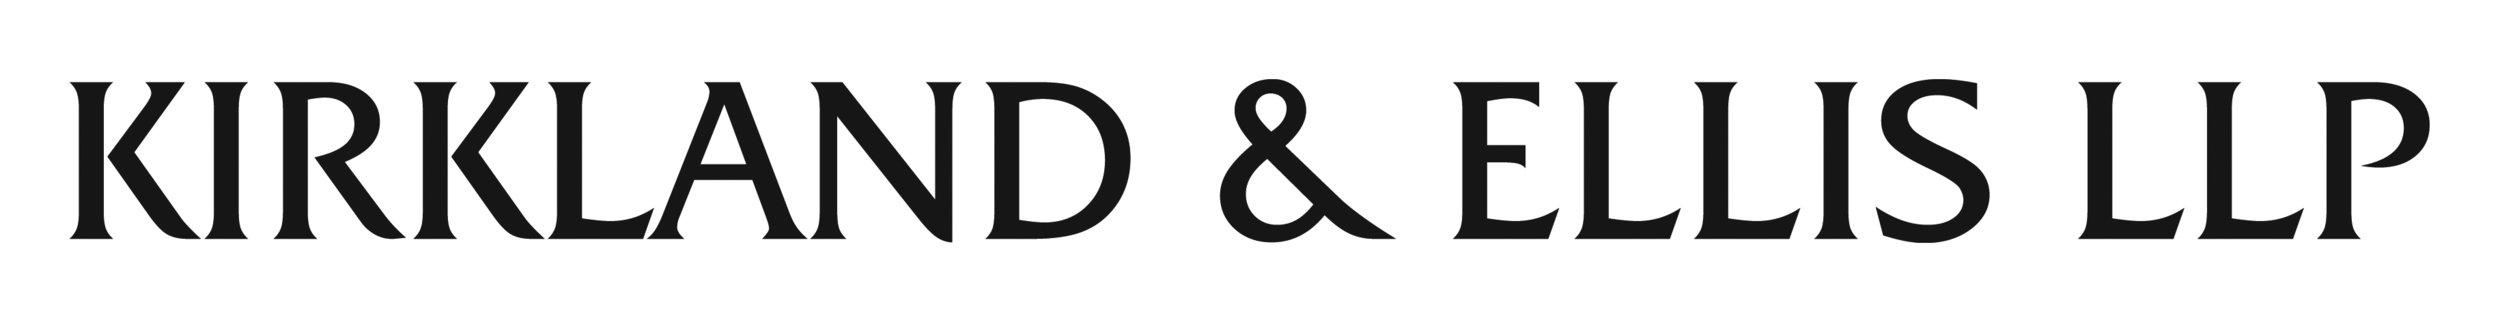 Kirkland & Ellis logo (black, large).jpg